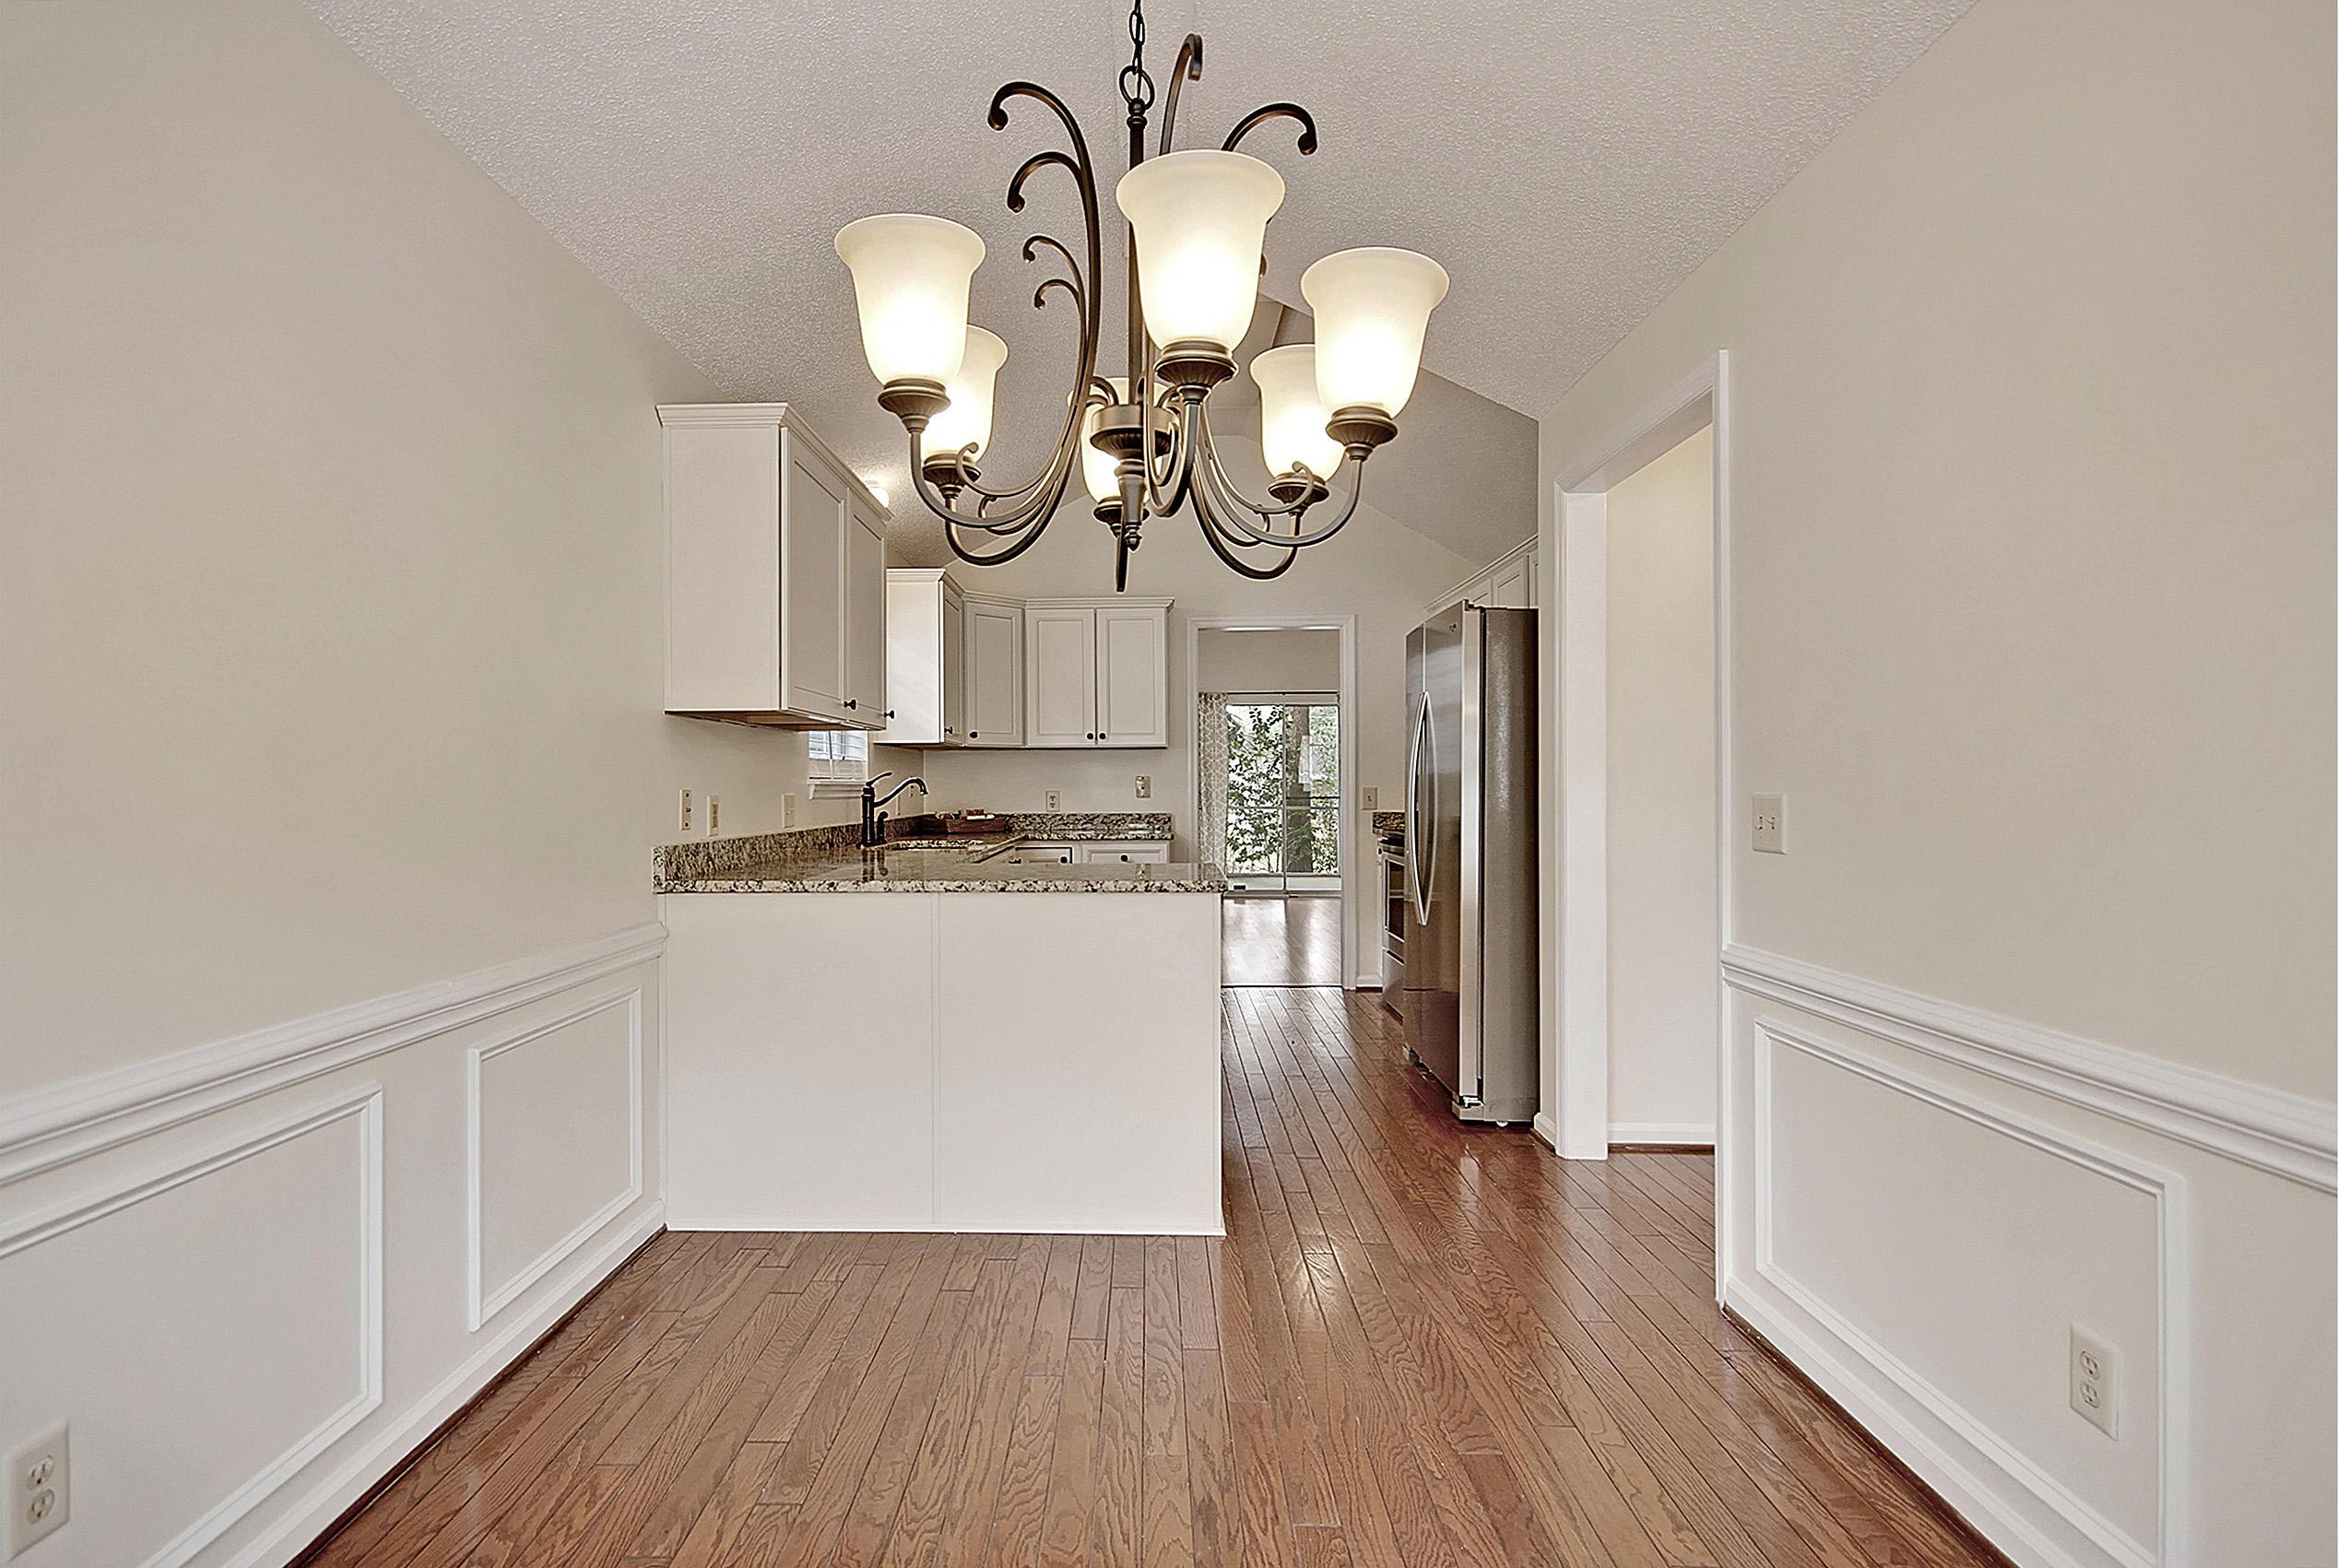 Harbor Place Homes For Sale - 845 Harbor Pl, Charleston, SC - 12